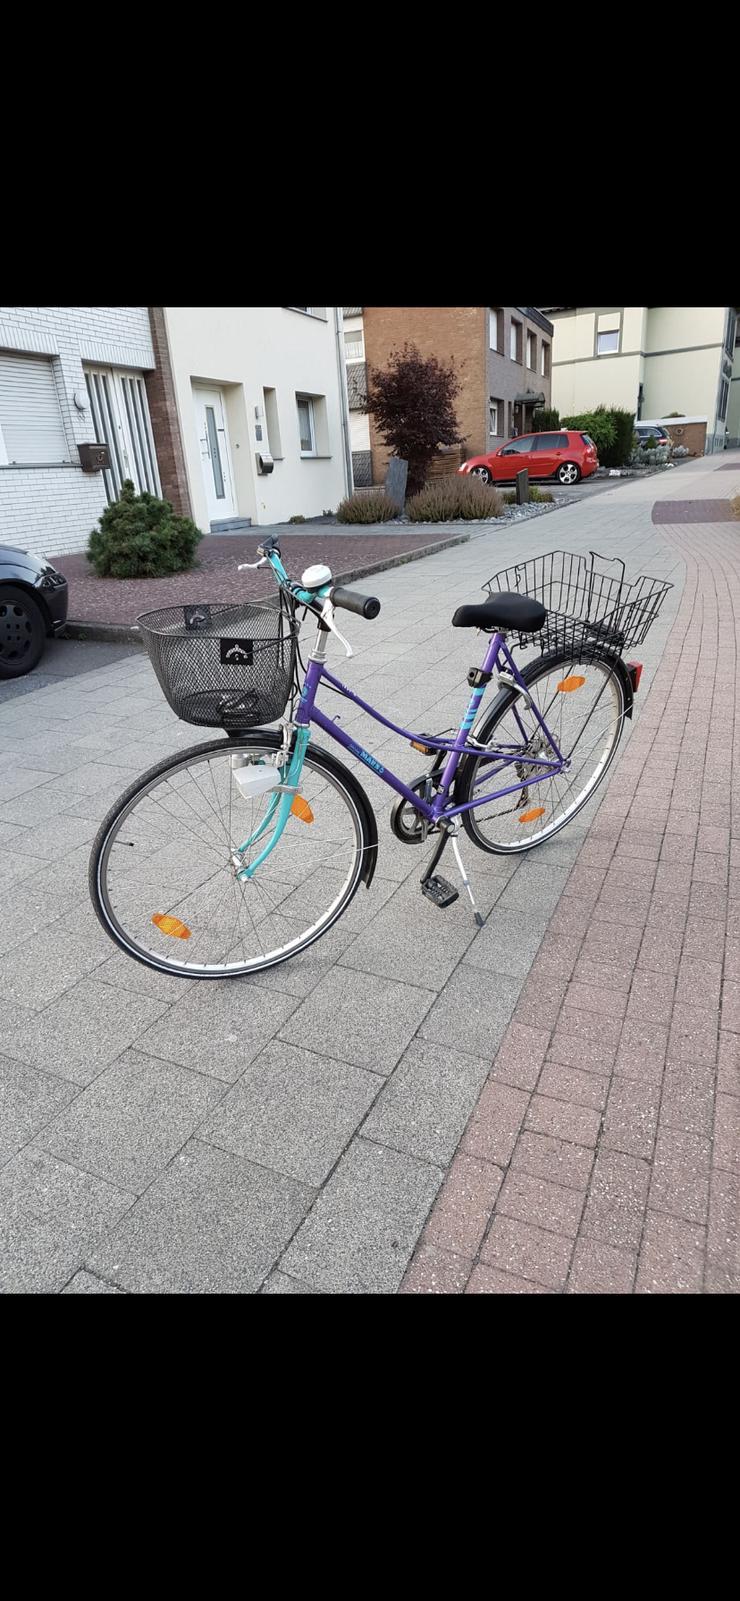 Damenrad zu verkaufen !!!